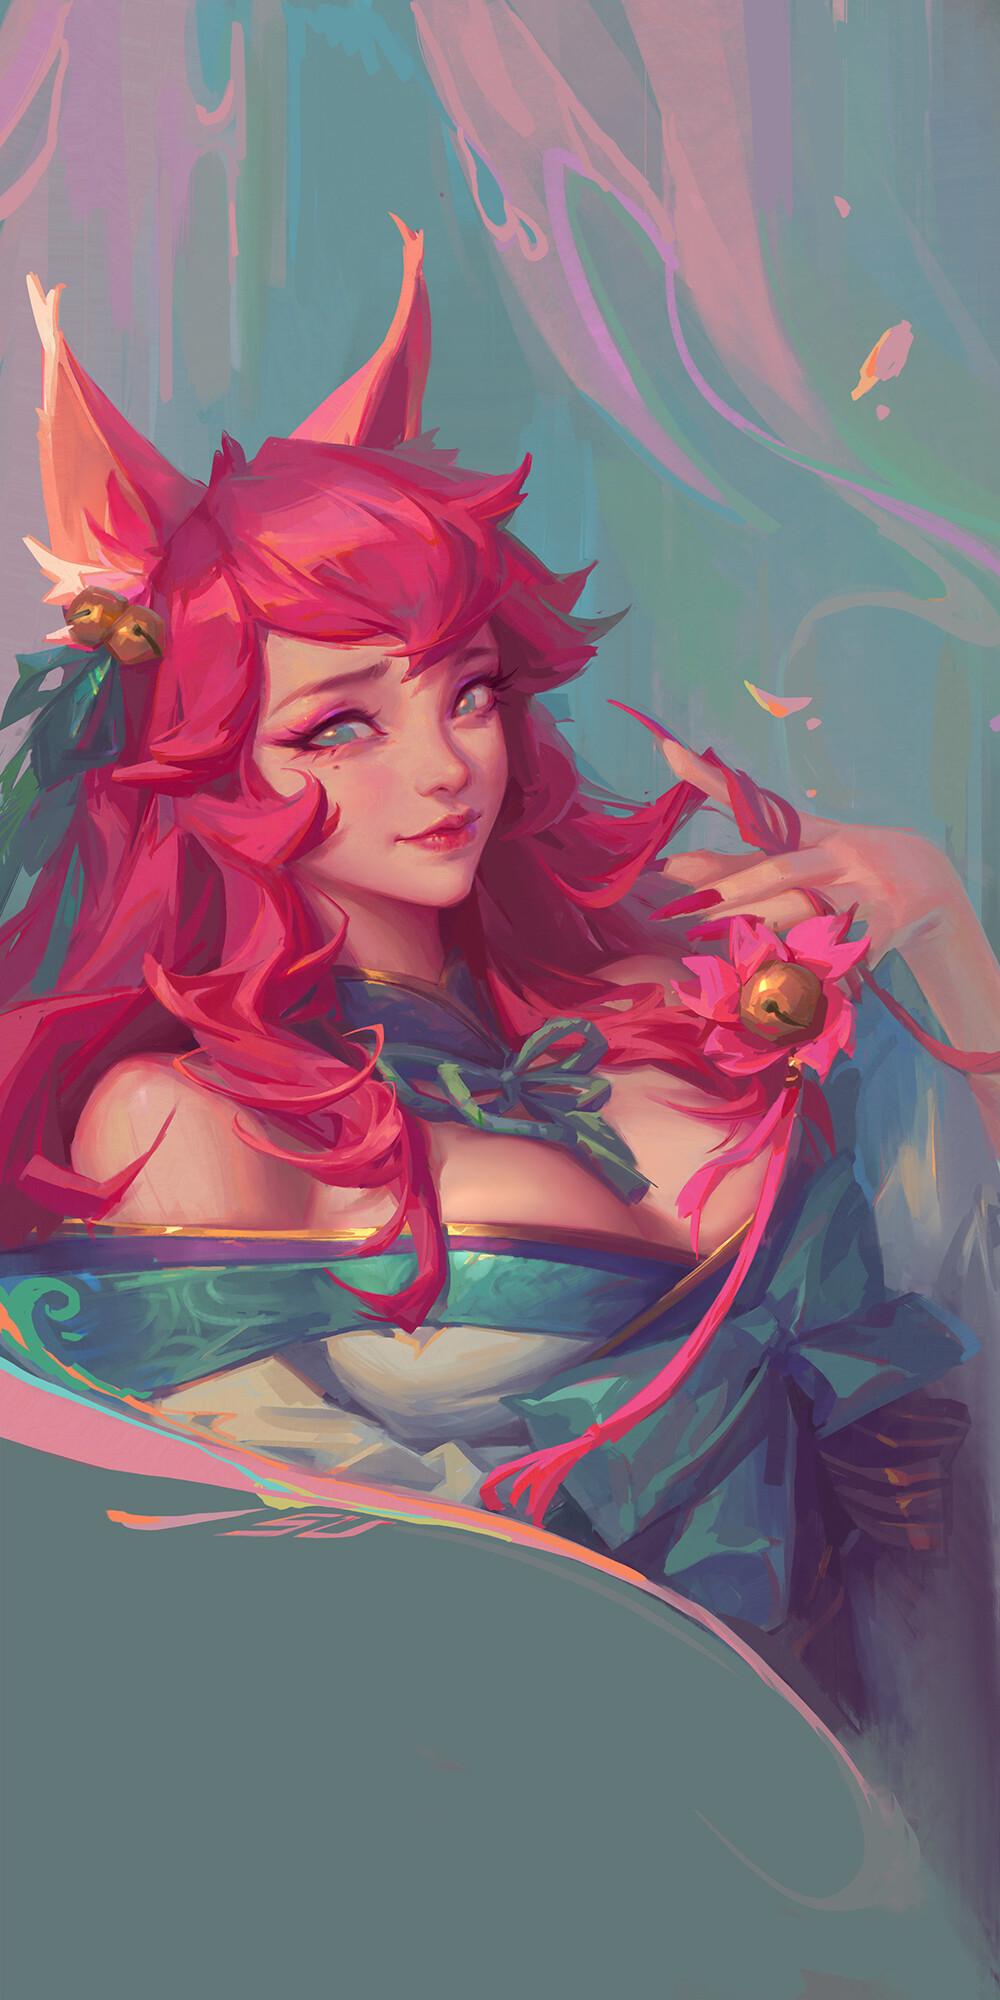 General 1000x2000 artwork ArtStation redhead long hair fantasy art fantasy girl painted nails League of Legends spirit blossom Ahri (League of Legends)